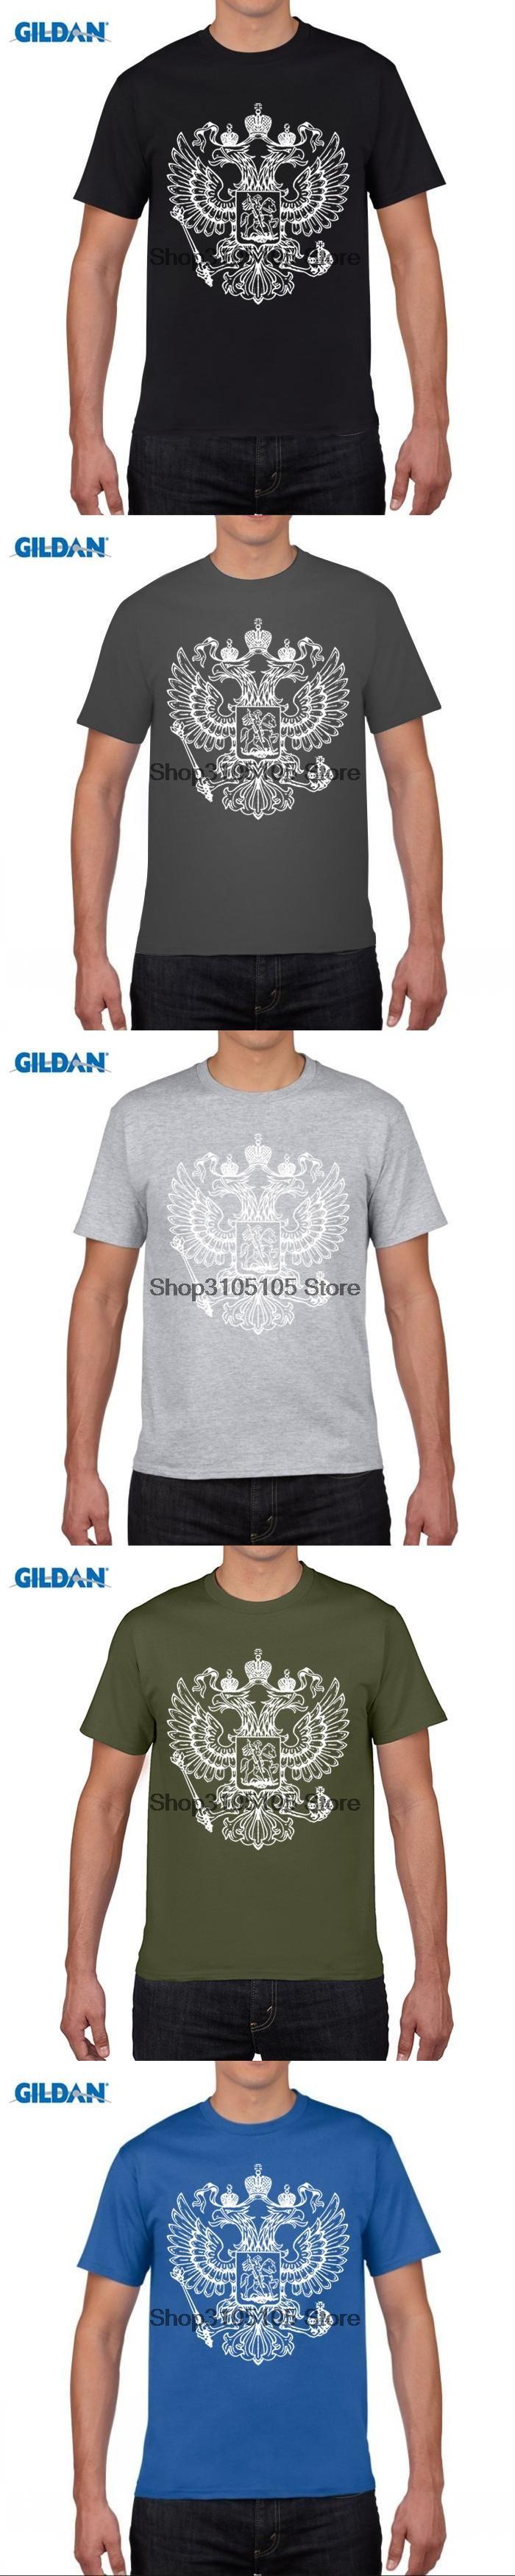 GILDAN Russian Double Headed Eagle T Shirt Coat of Arms of Russia Men's Tee Retro Printing Short Sleeve Cotton 100% t shirt